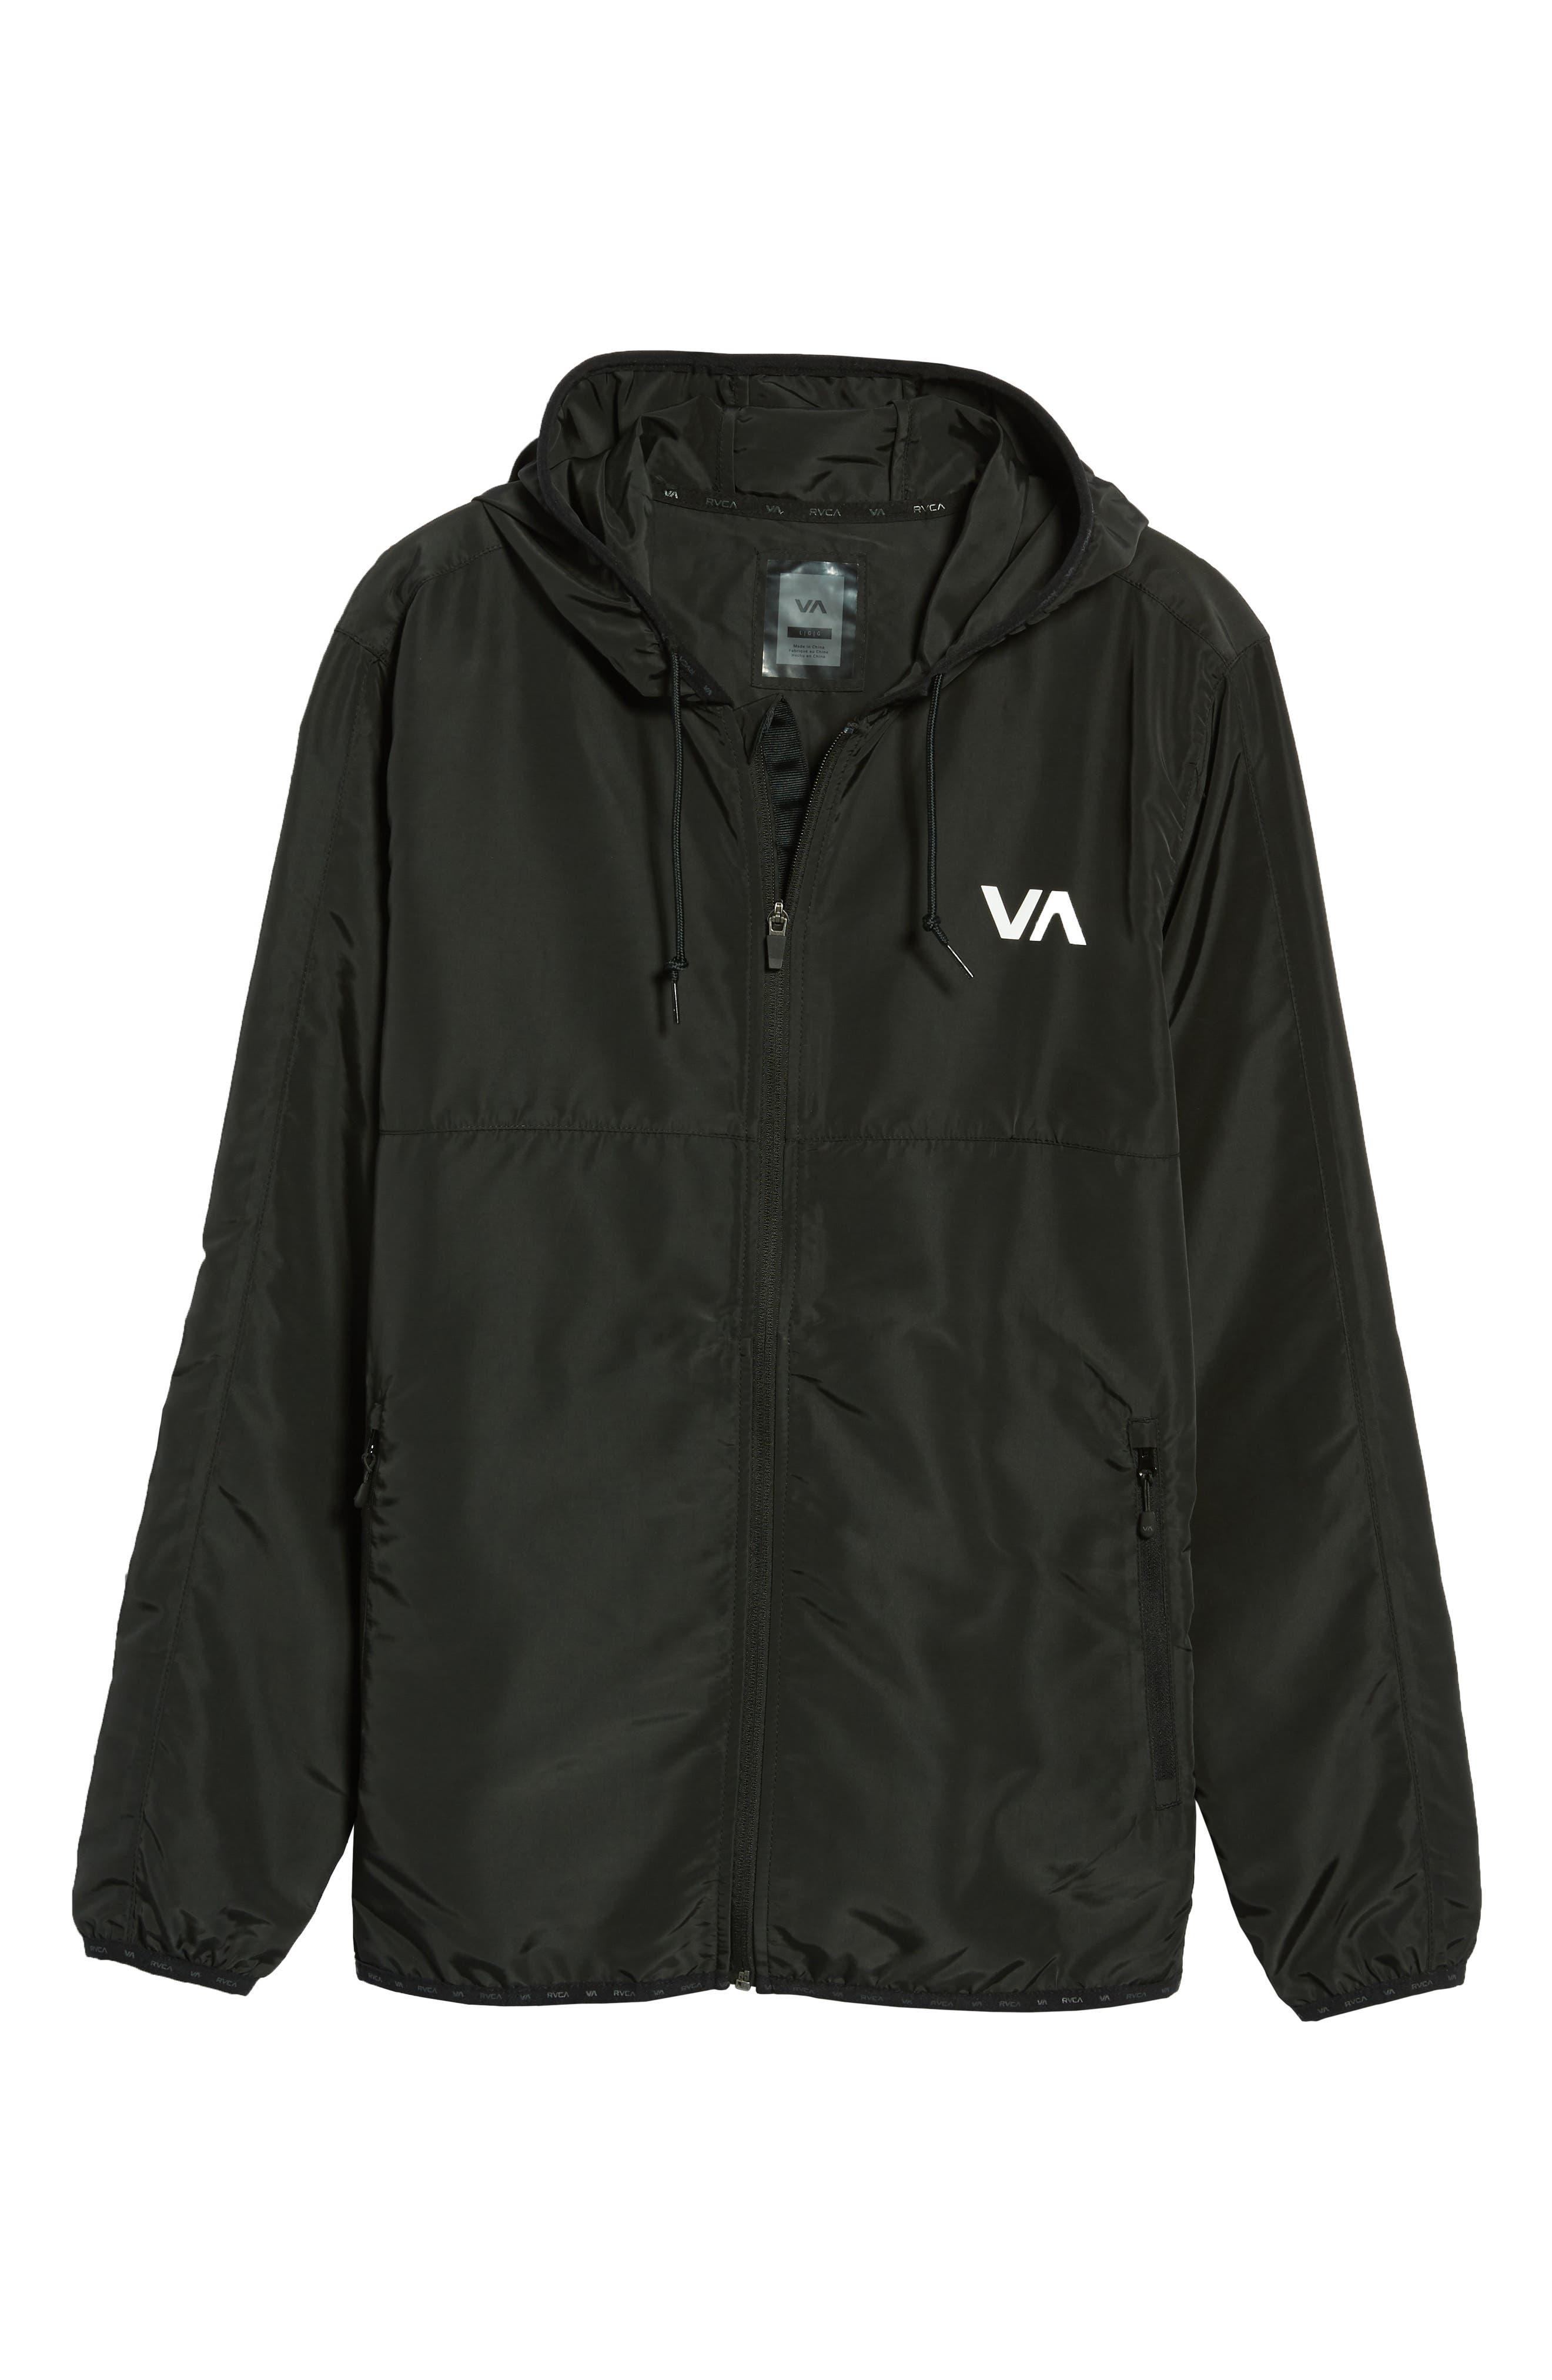 Axe Packable Water Resistant Jacket,                             Alternate thumbnail 4, color,                             BLACK